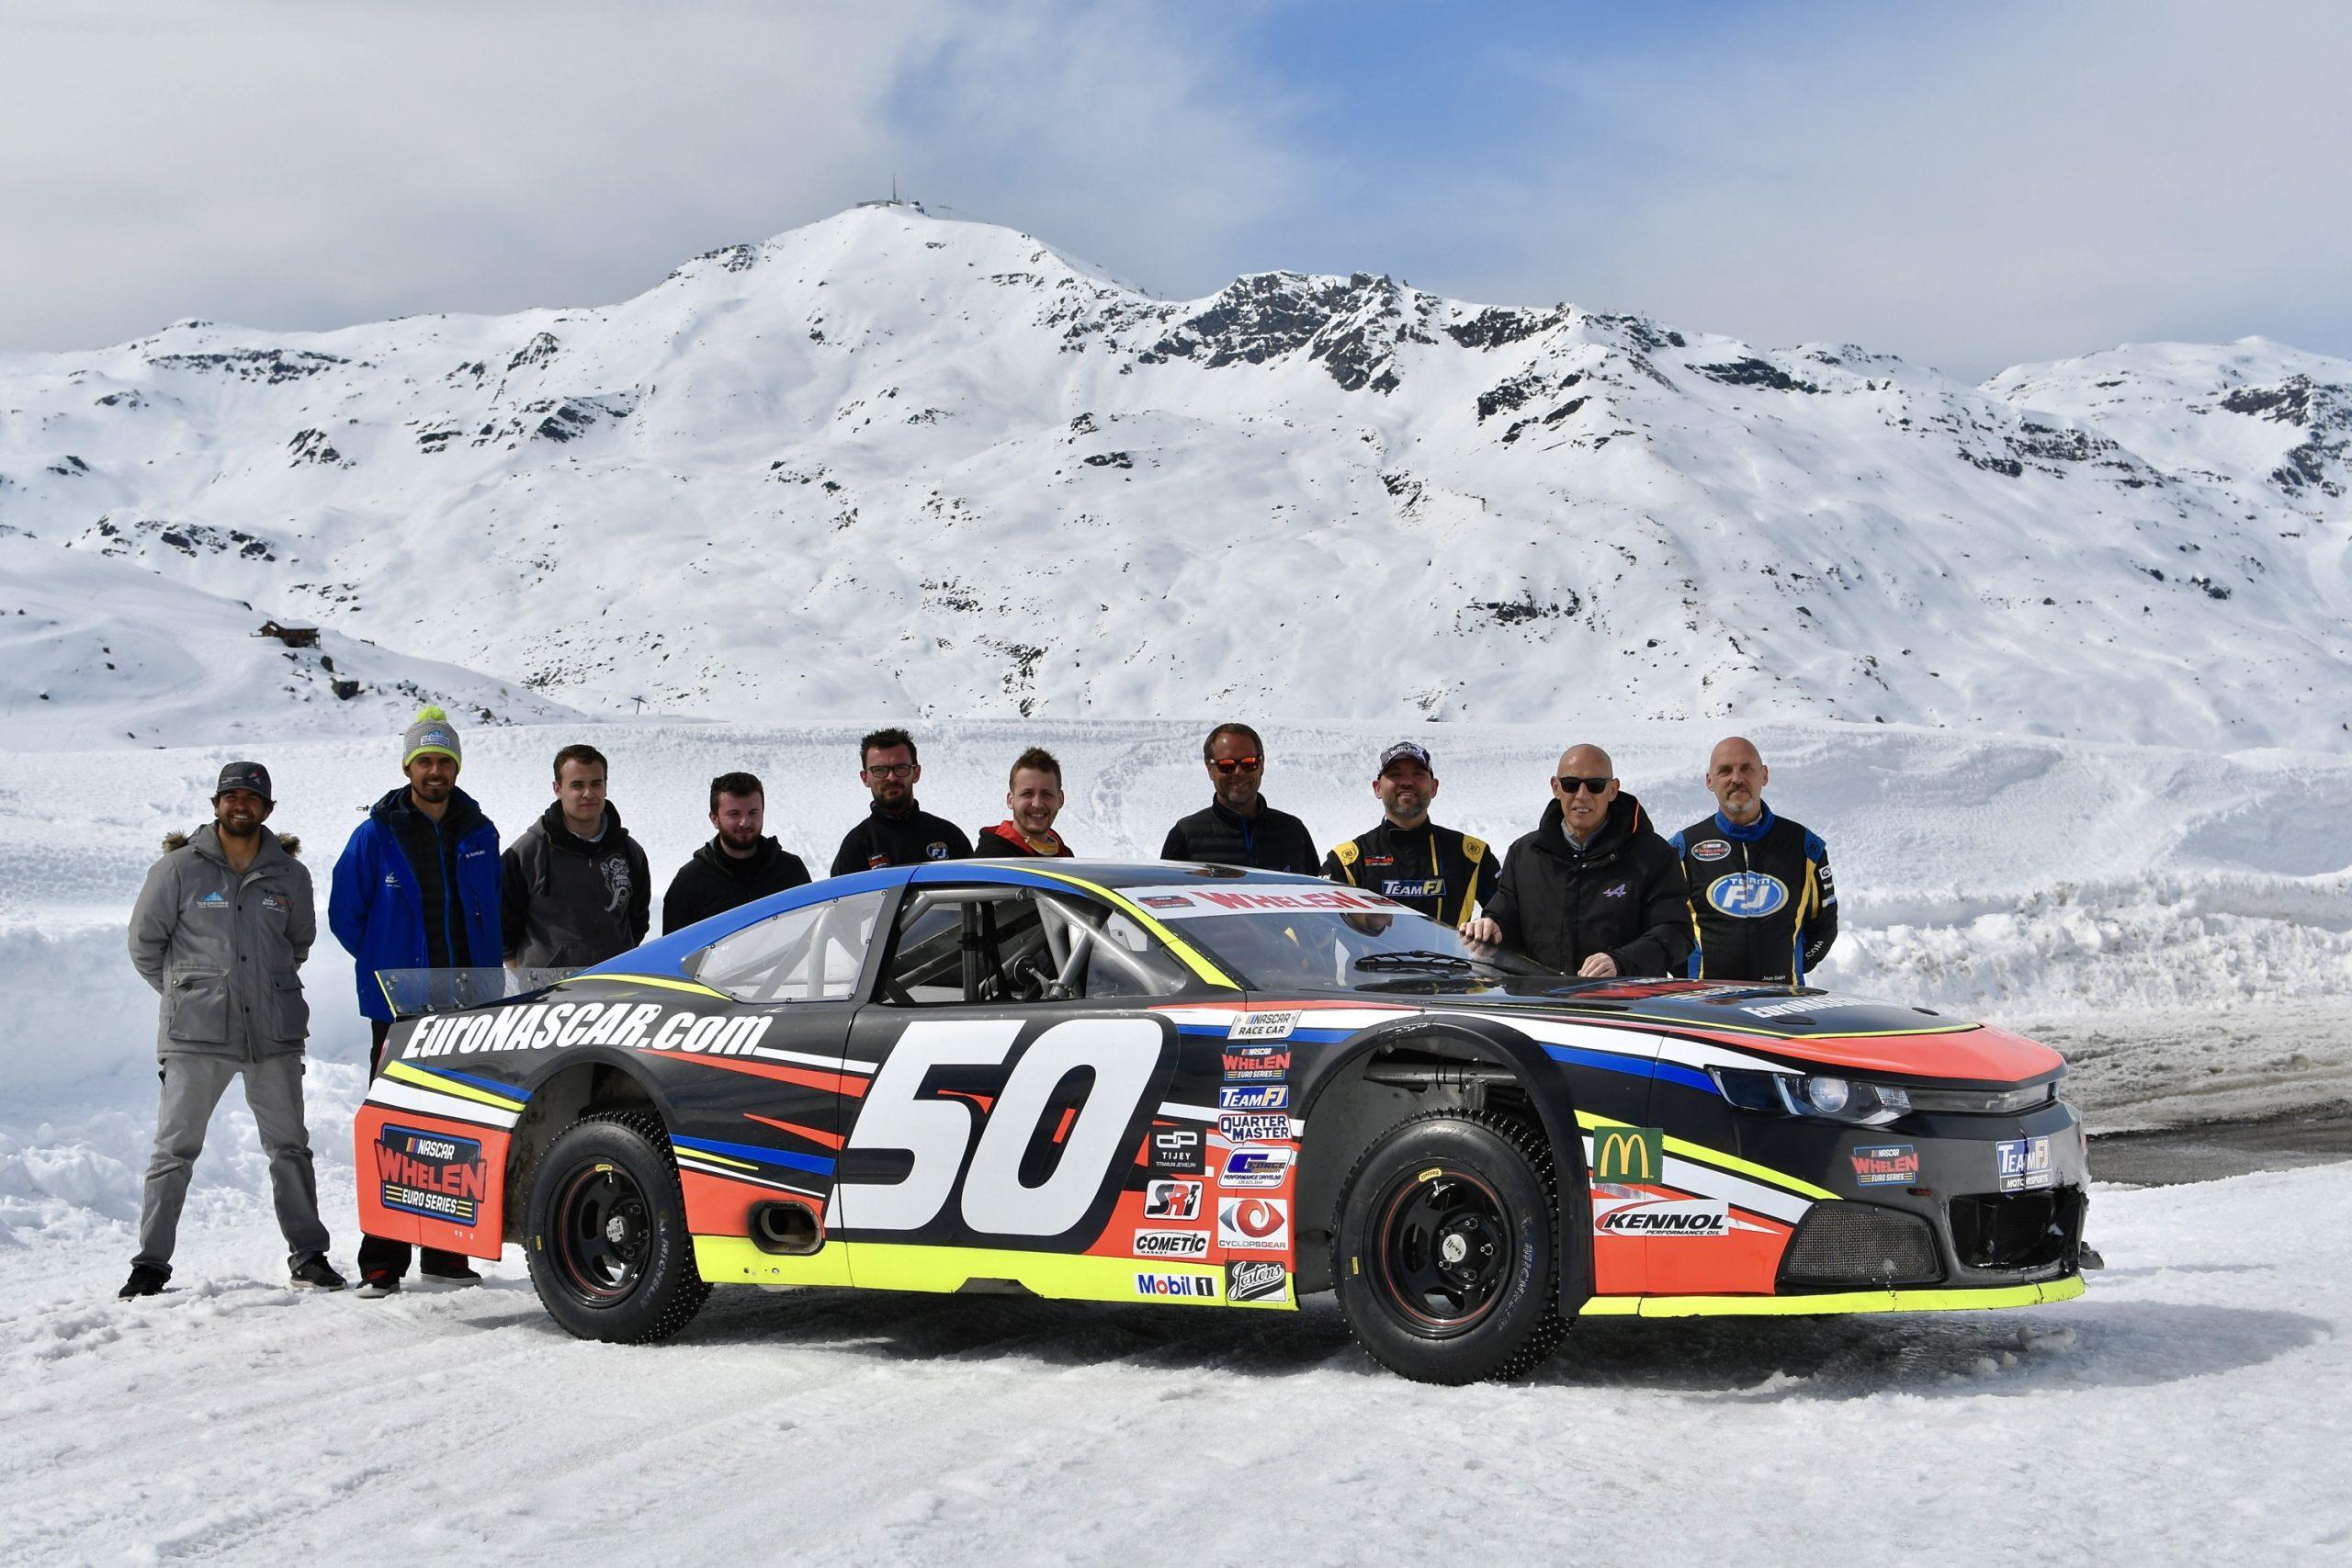 NASCAR on ice front three-quarter team